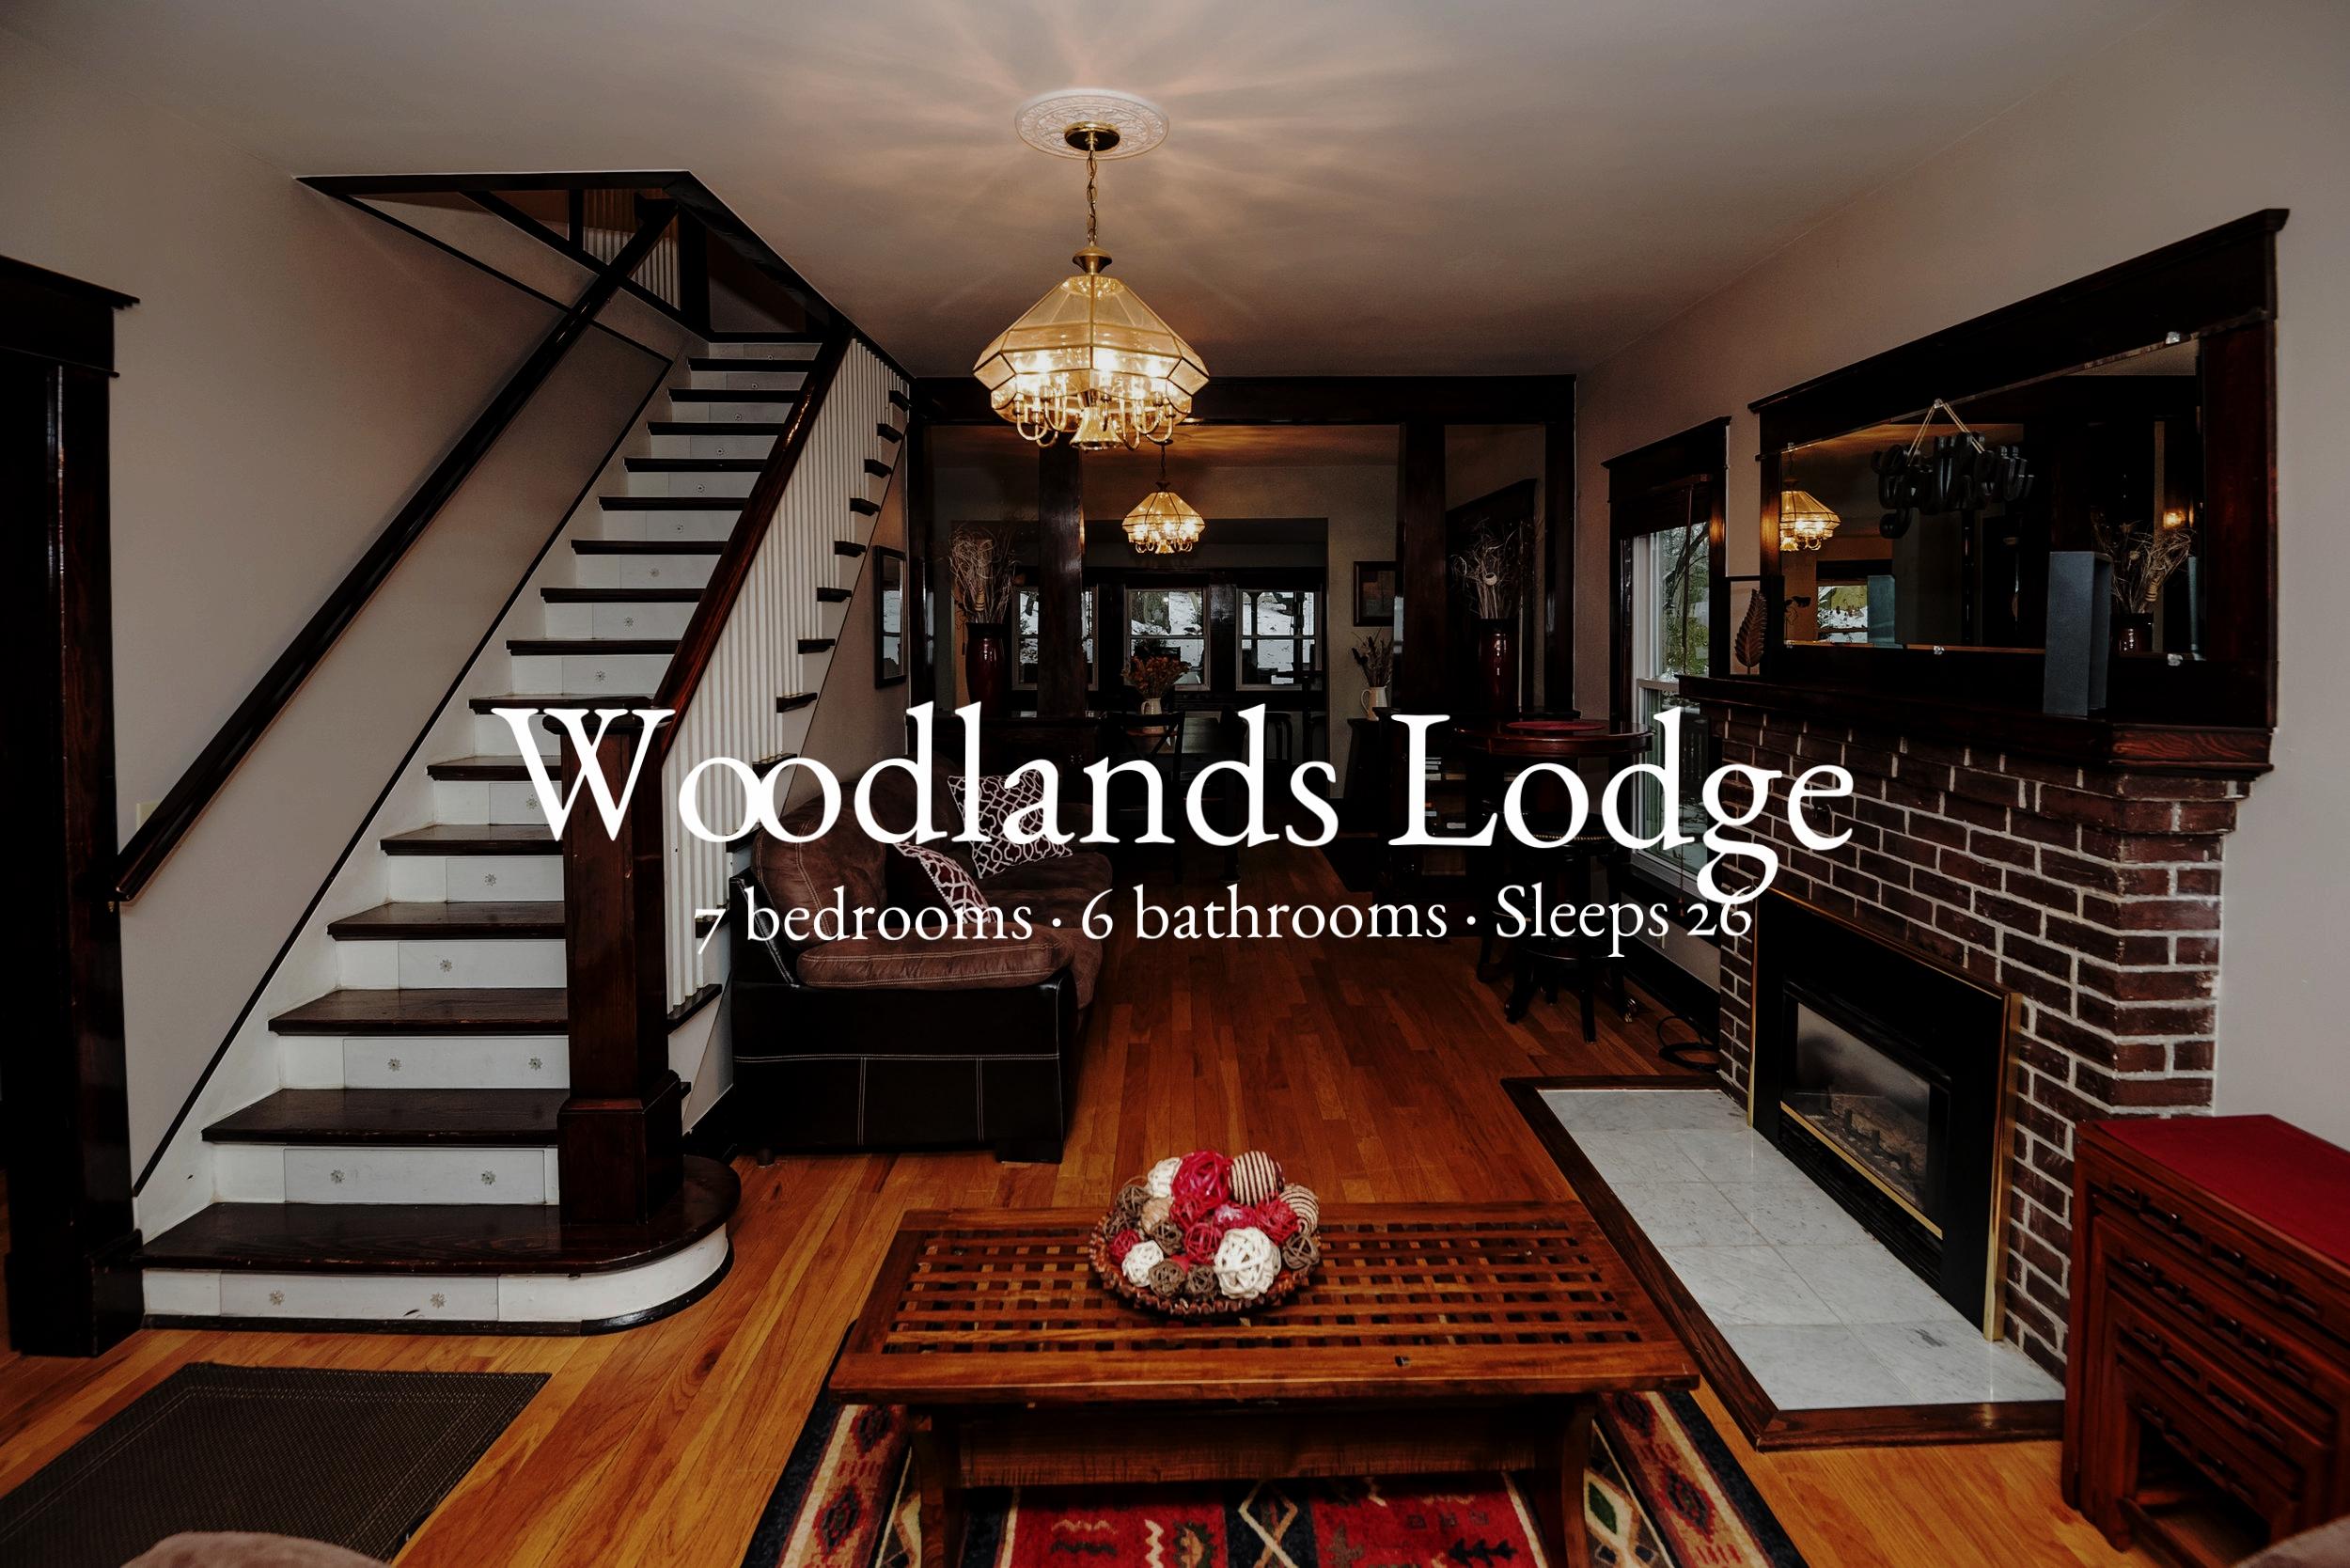 woodslandlodge-15.jpg